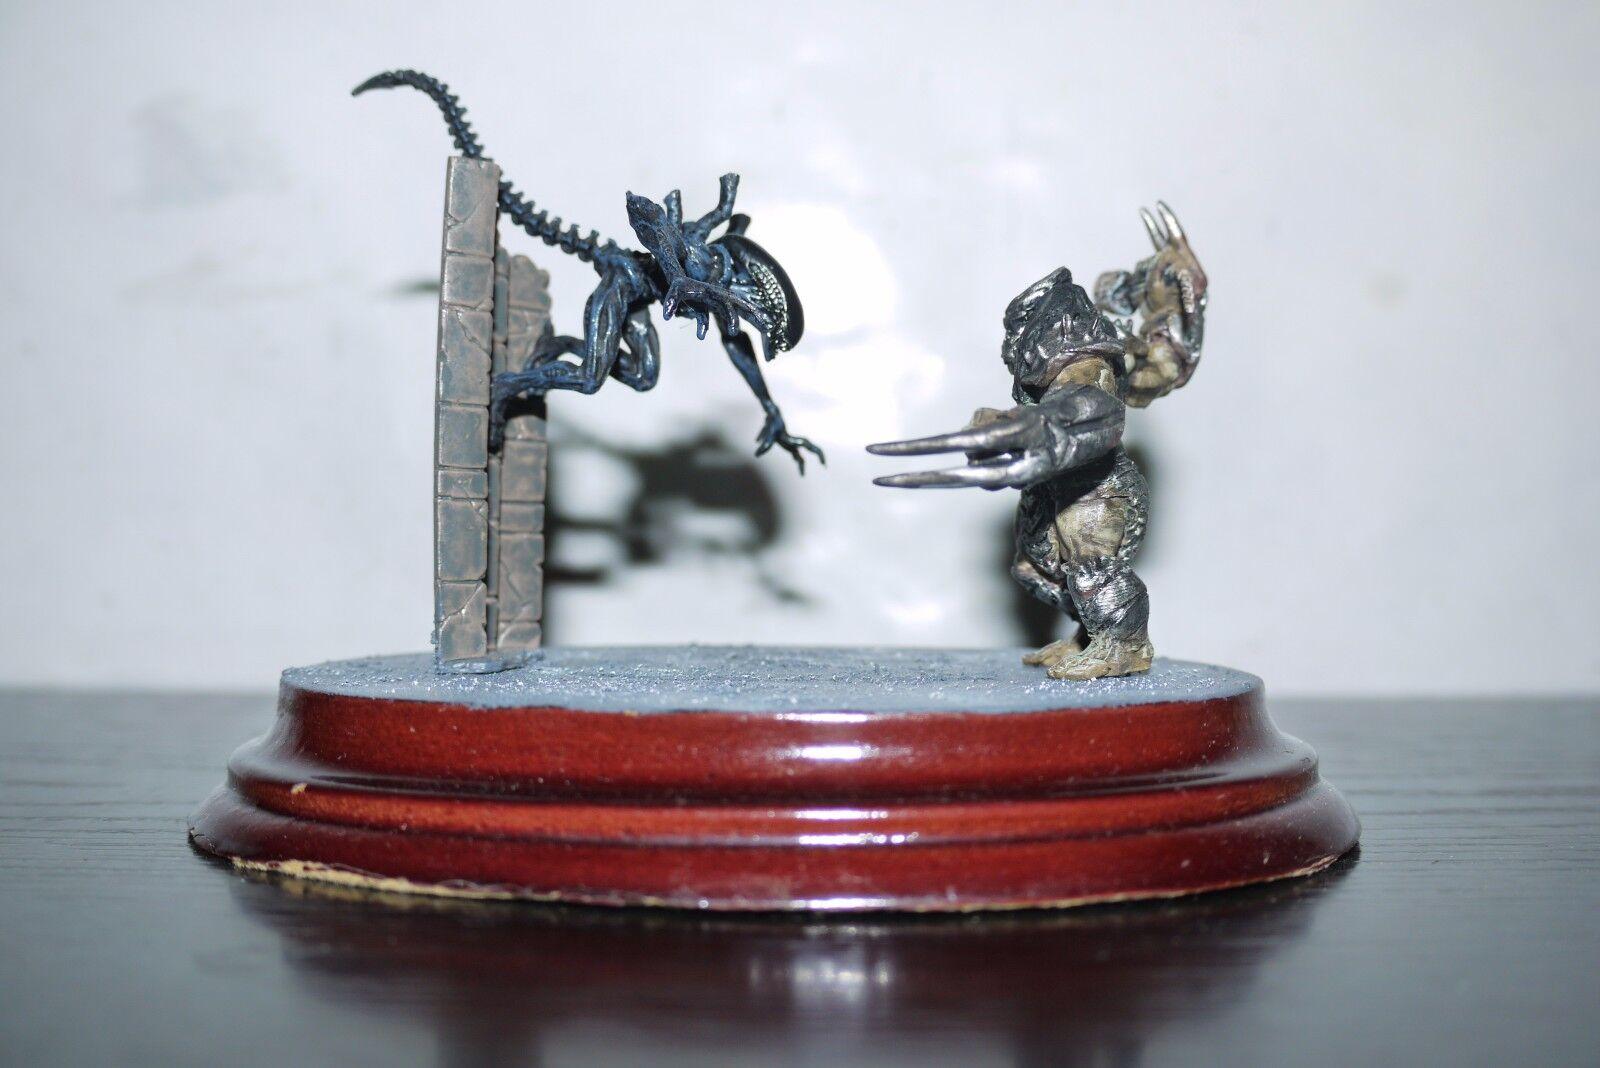 Avp alien vs protator wand und miniatur - diorama pvc horrorclix umbasierten